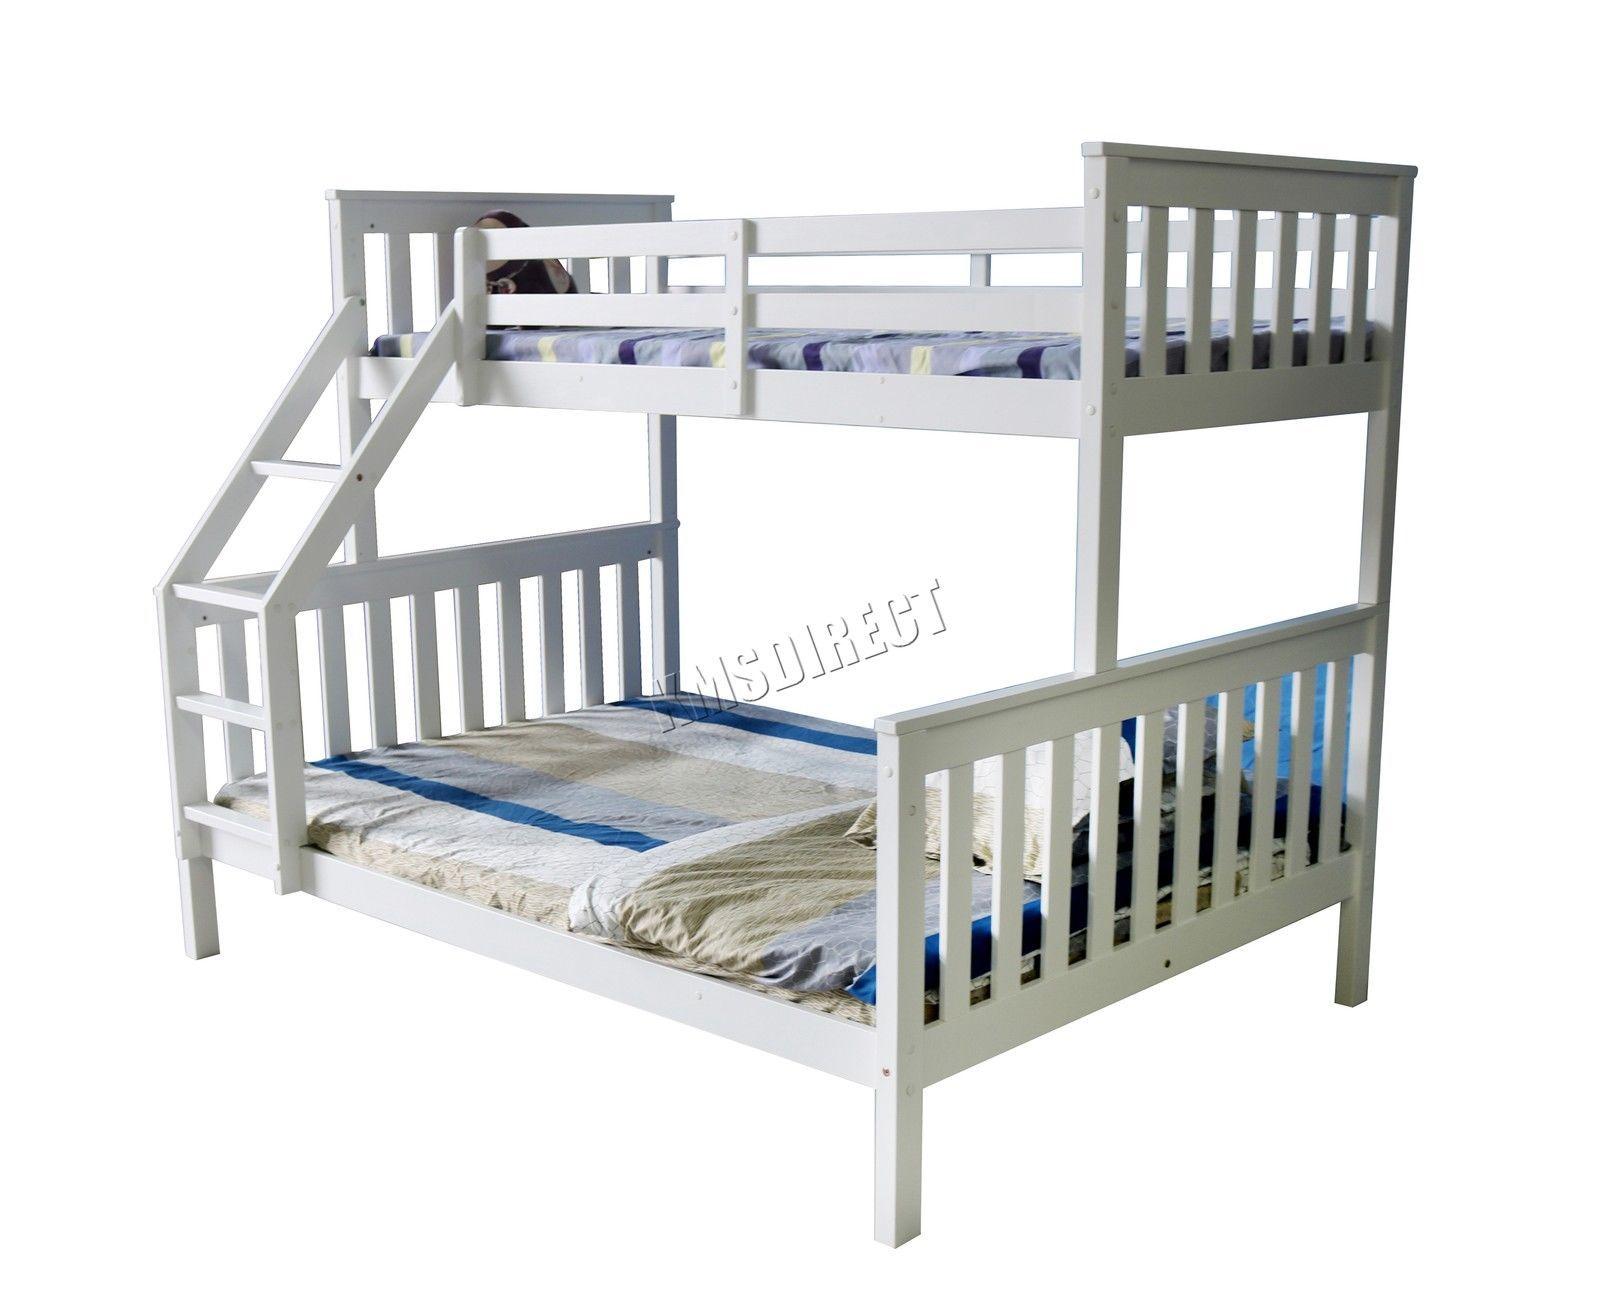 foxhunter bunk bed wooden frame children kids triple sleeper no mattress white - Ebay Bed Frames